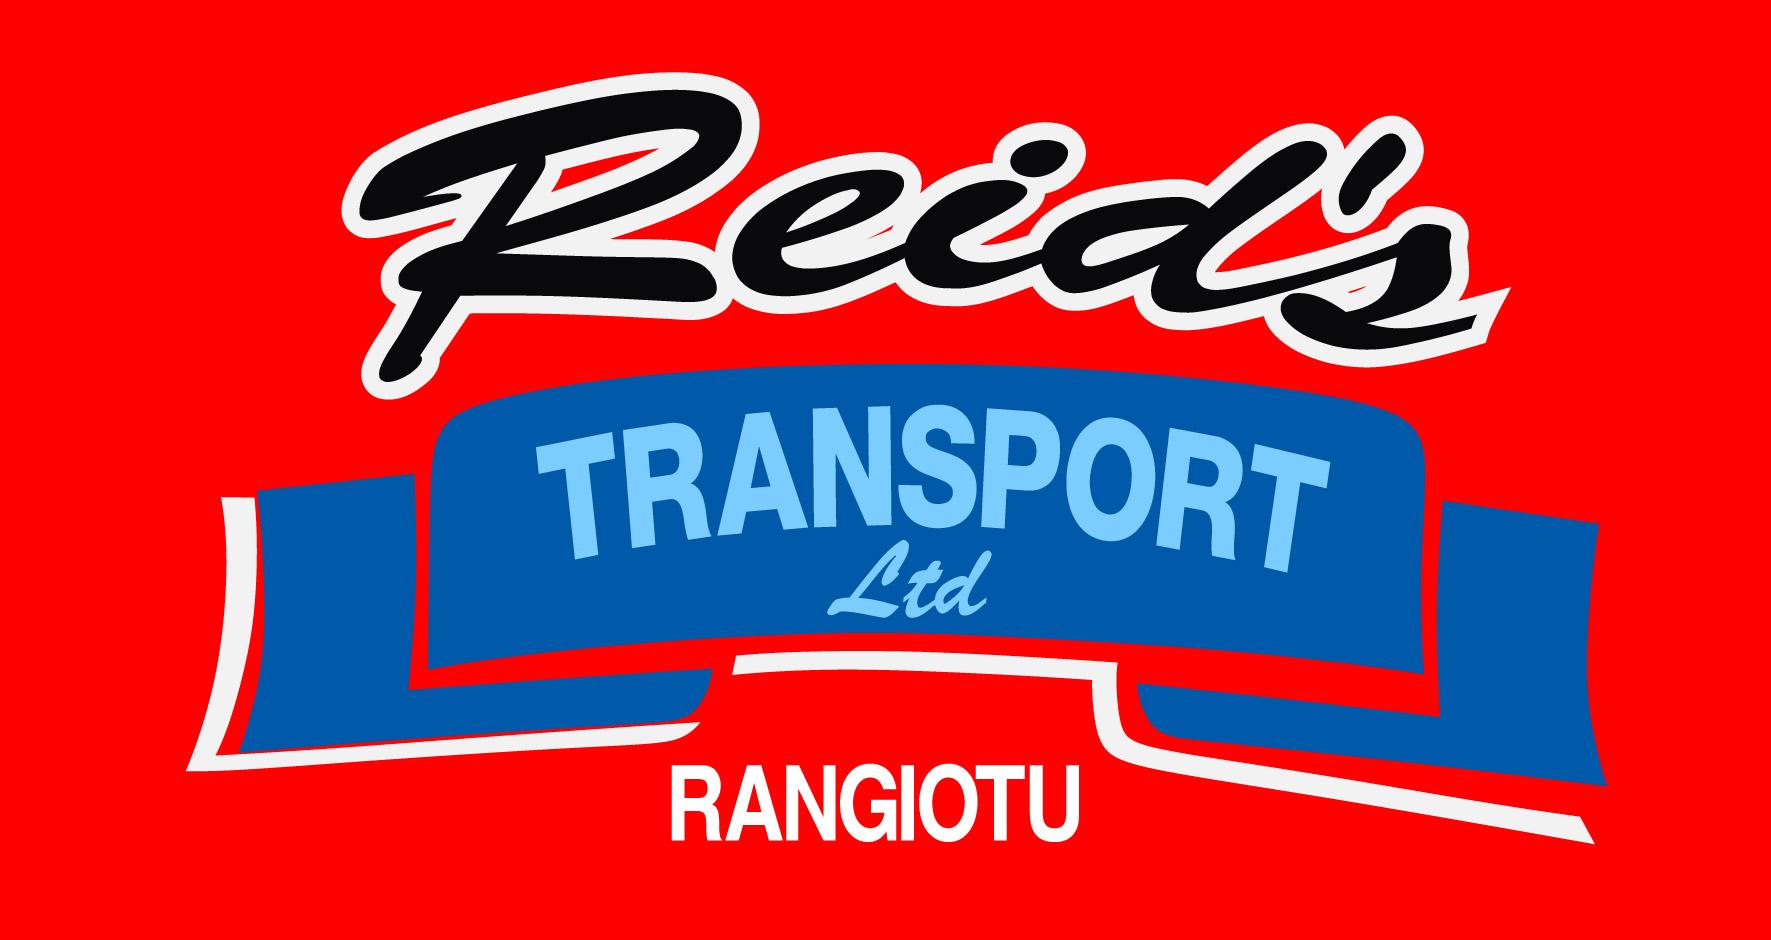 reids-transport